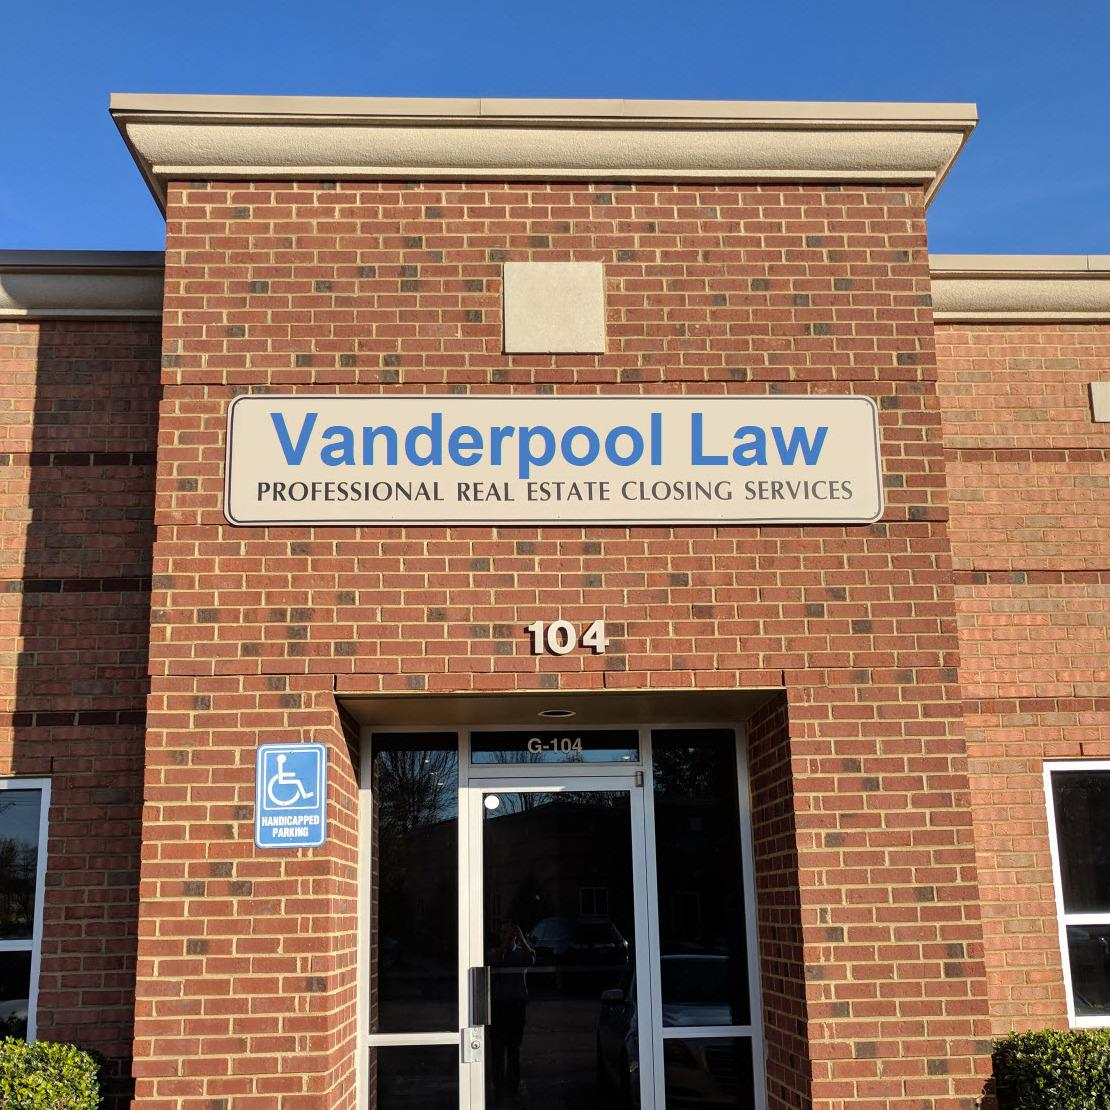 Vanderpool Law image 1